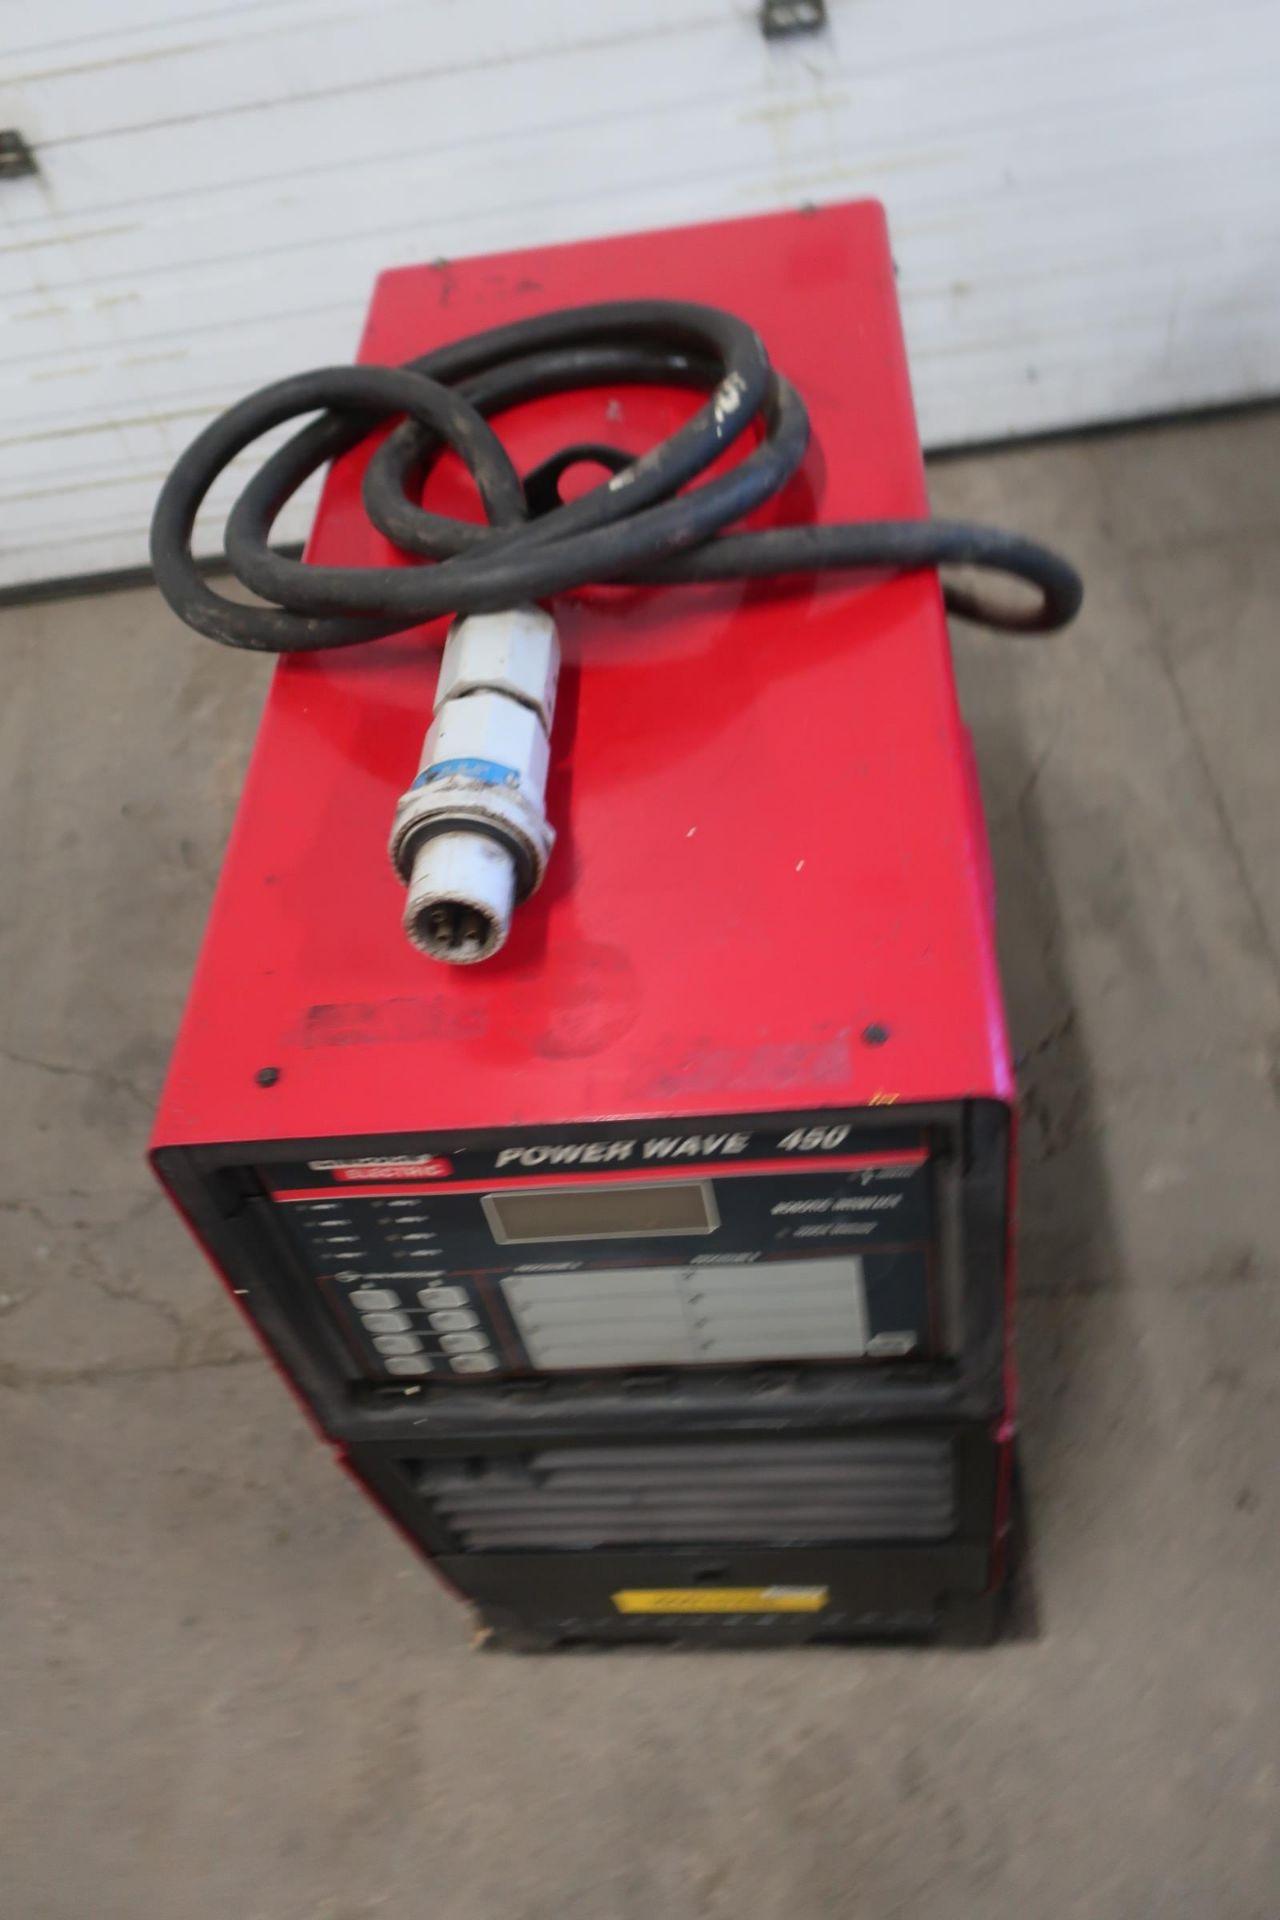 Lincoln Powerwave 450 Robotic Mig Welding Power Source - 450 amp - Image 2 of 2